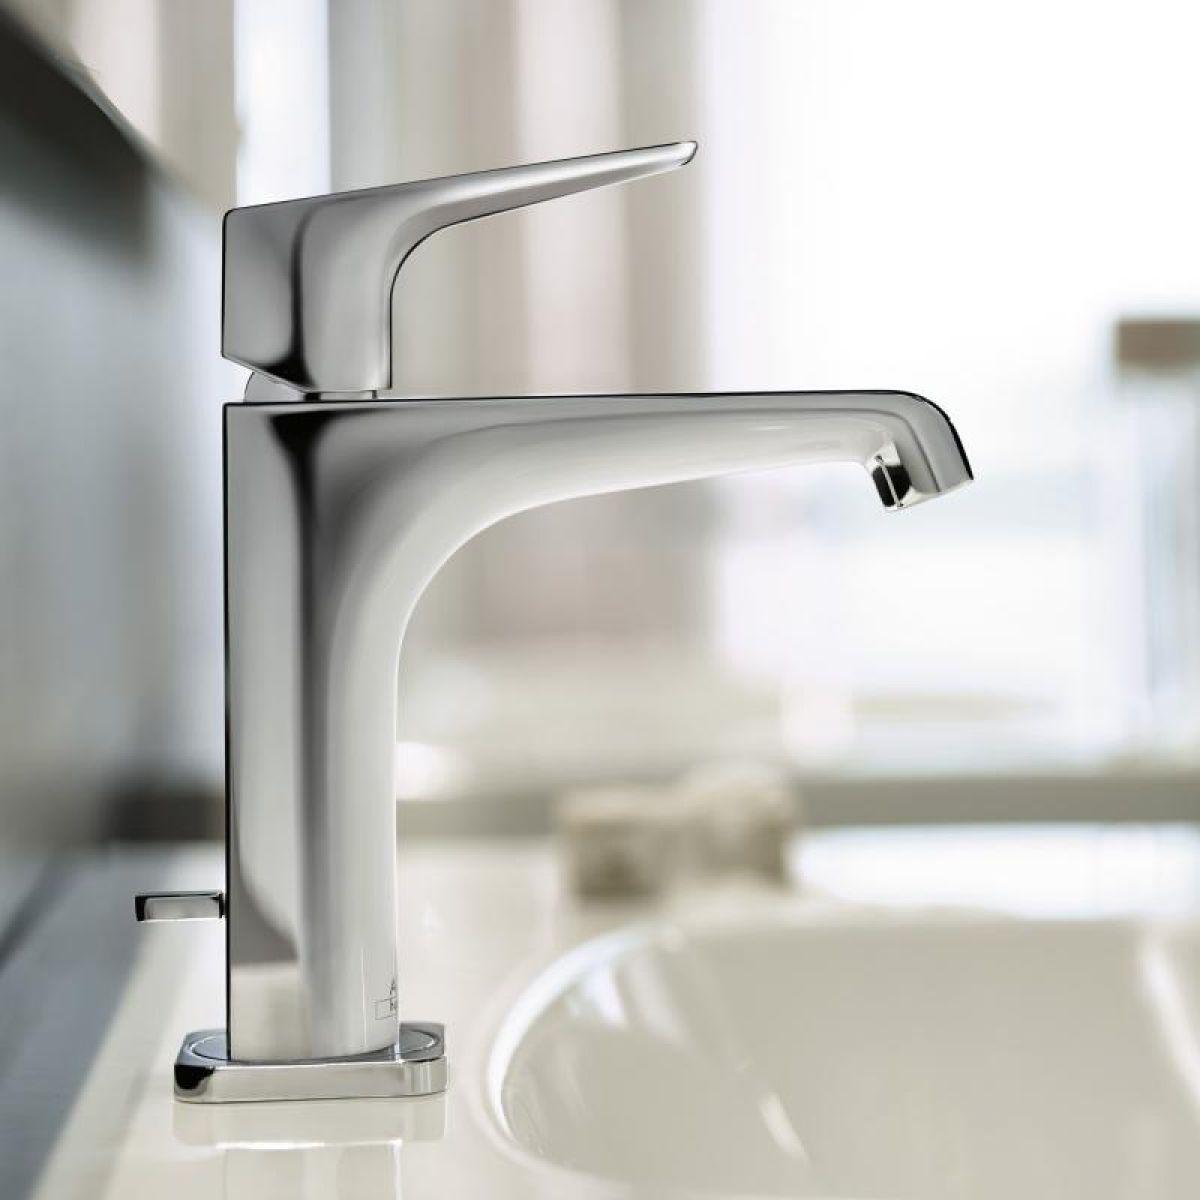 axor citterio e 125 basin mixer tap uk bathrooms. Black Bedroom Furniture Sets. Home Design Ideas